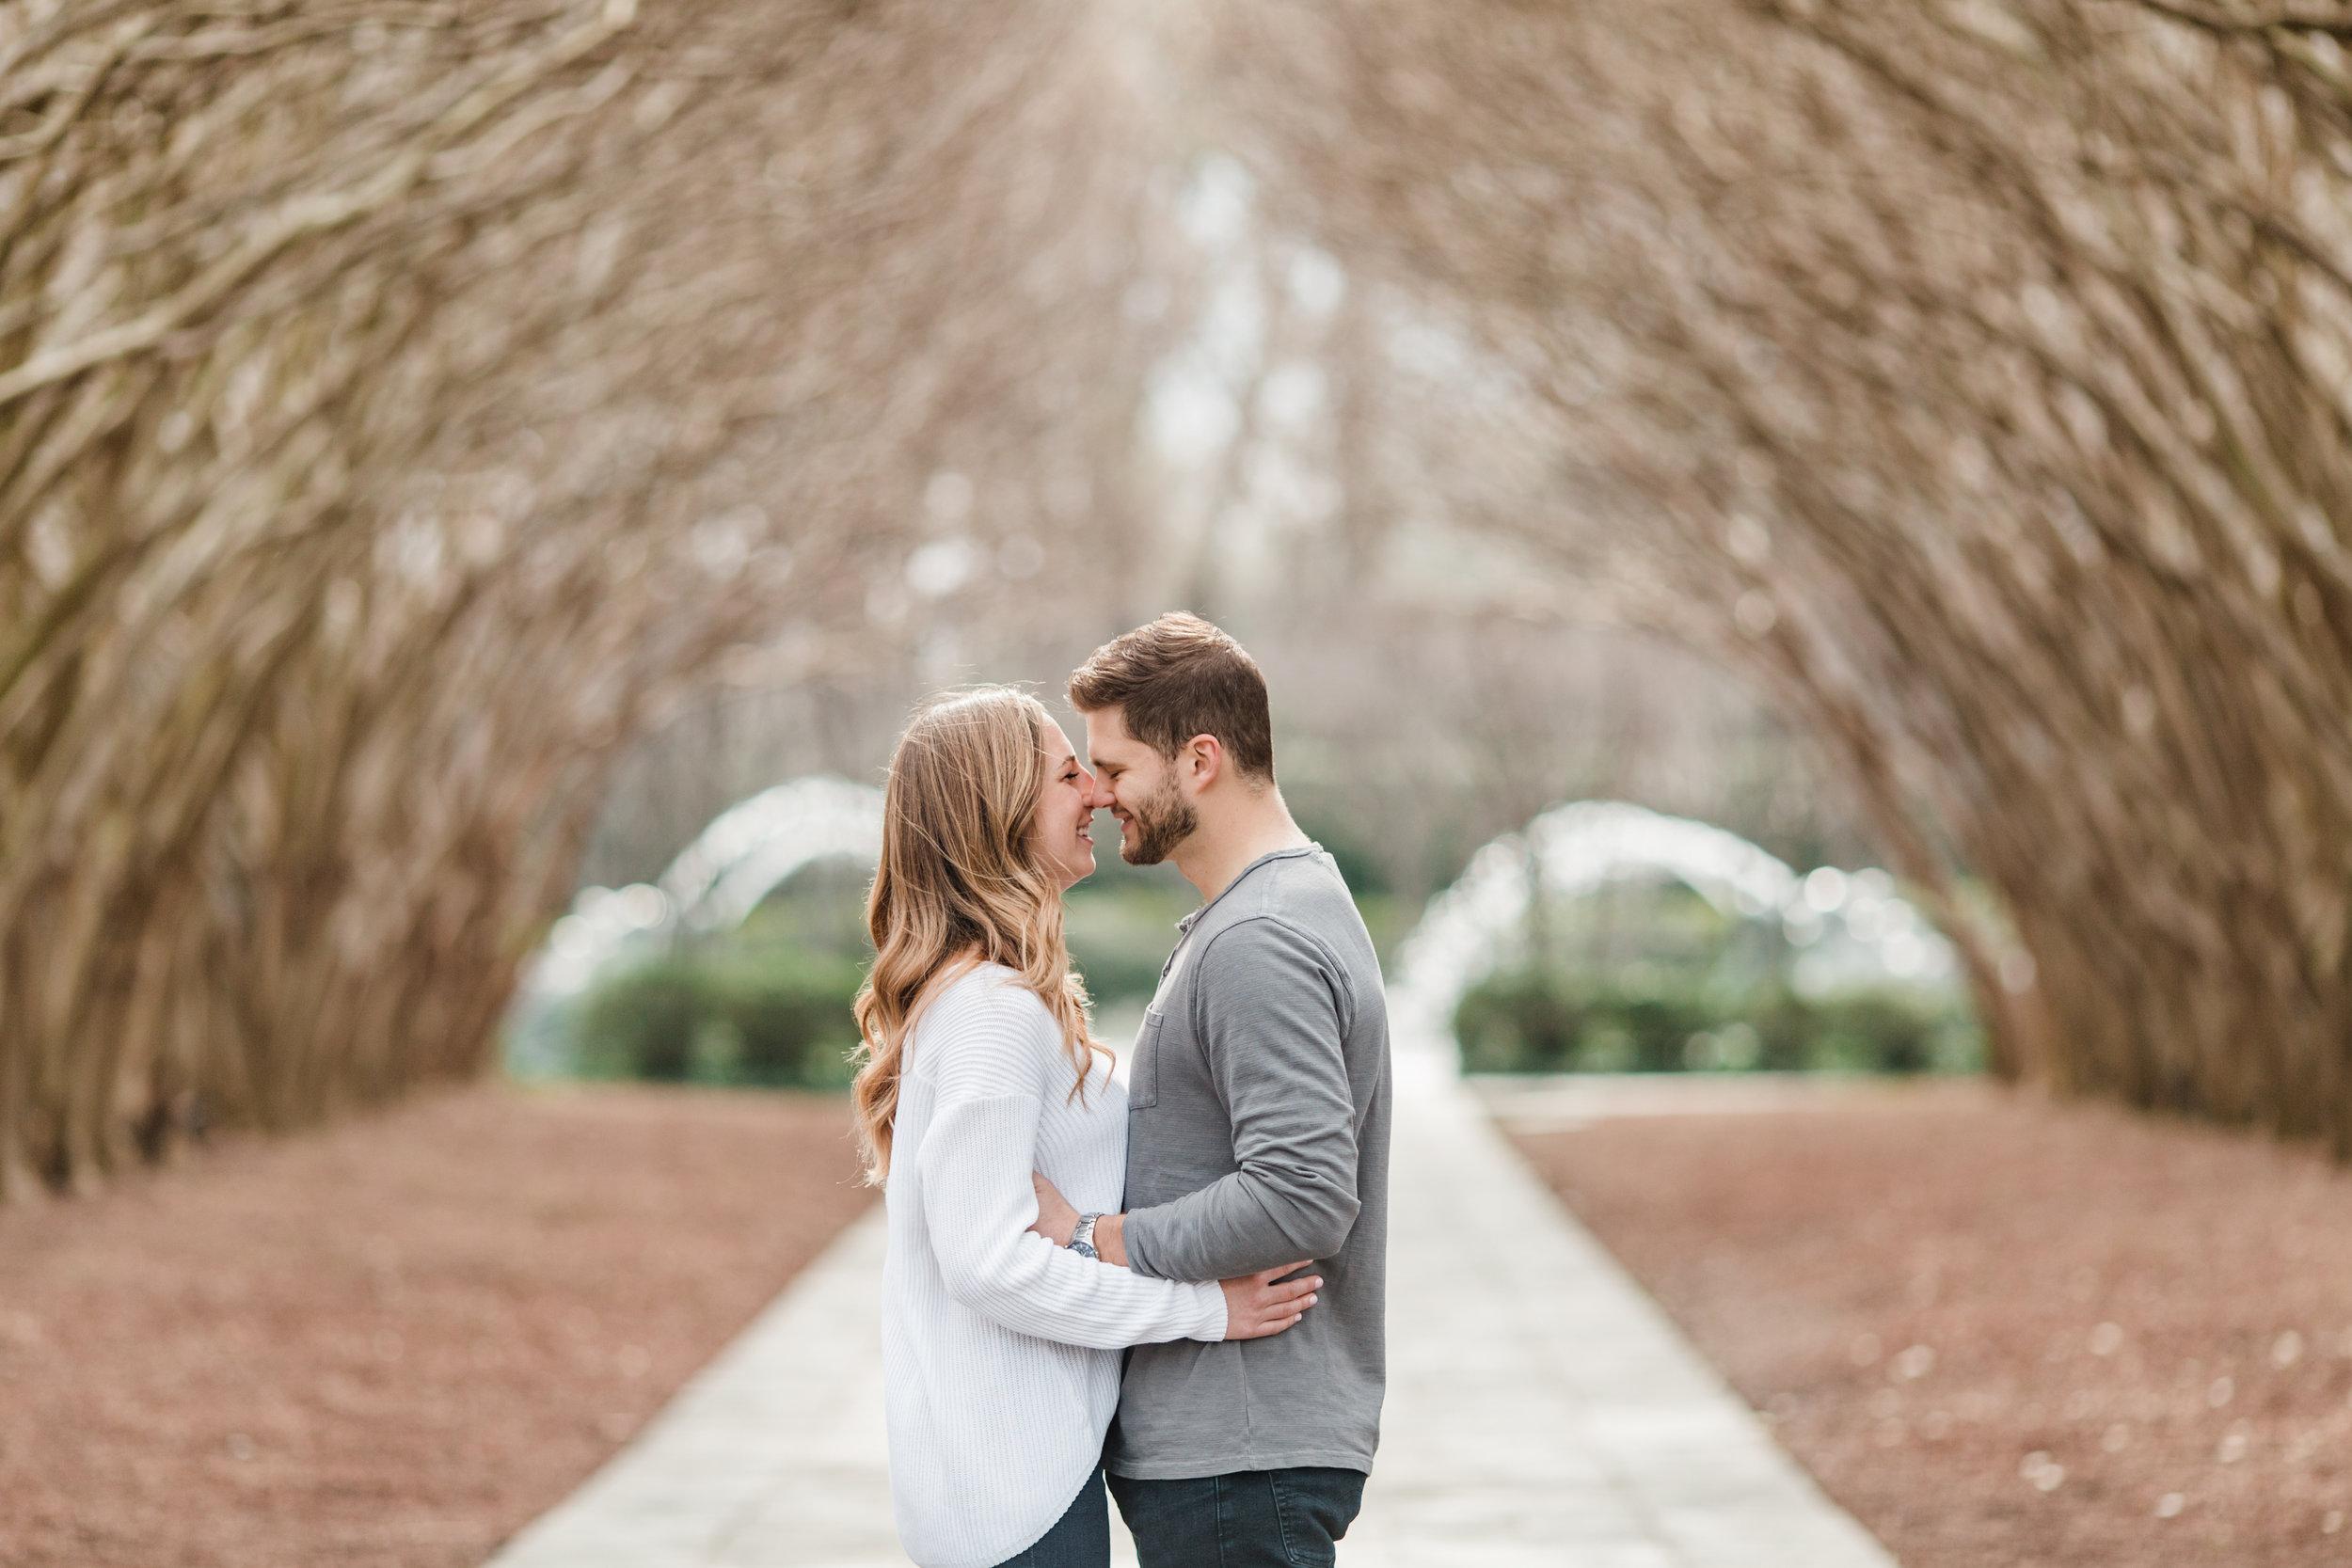 Dallas-Texas-Engagement-Session-Dallas-Arboretum-L.A.R.Weddings-Lindsey-Ramdin-27.jpg